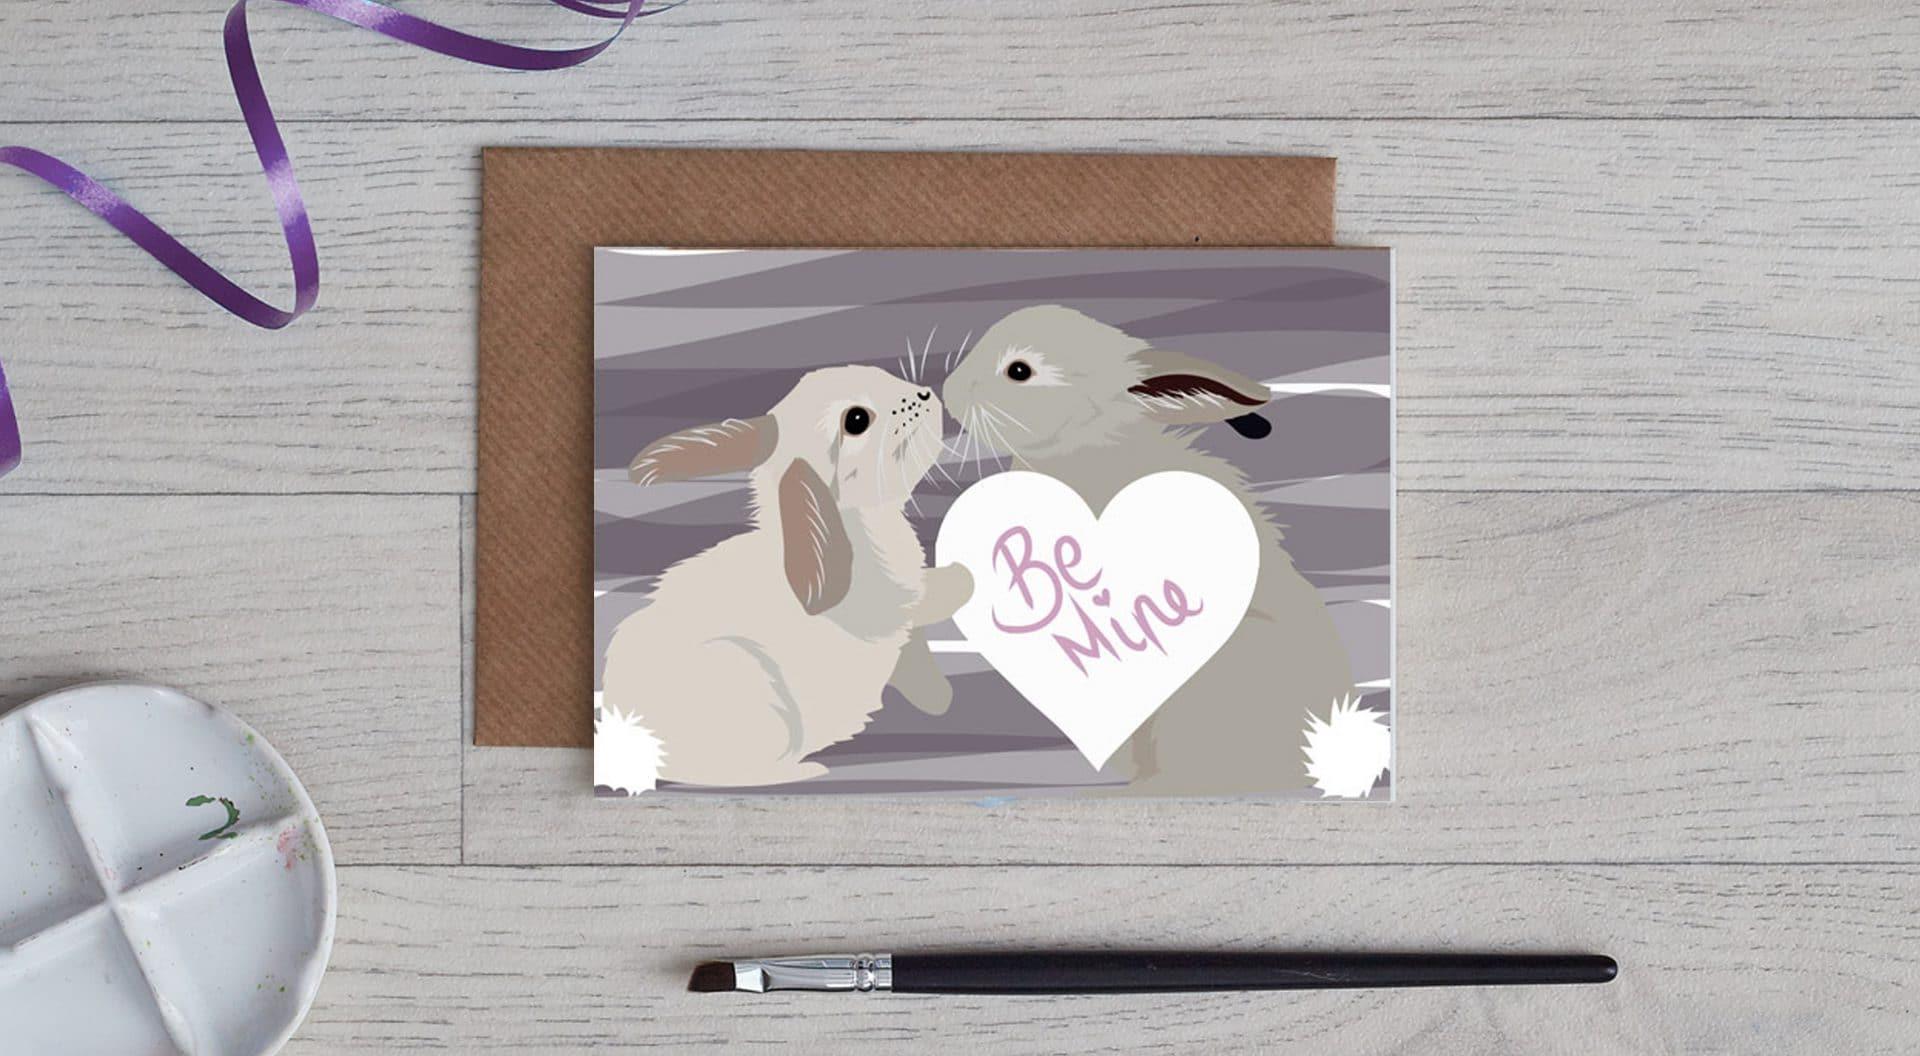 Be mine, rabbit valentines day card